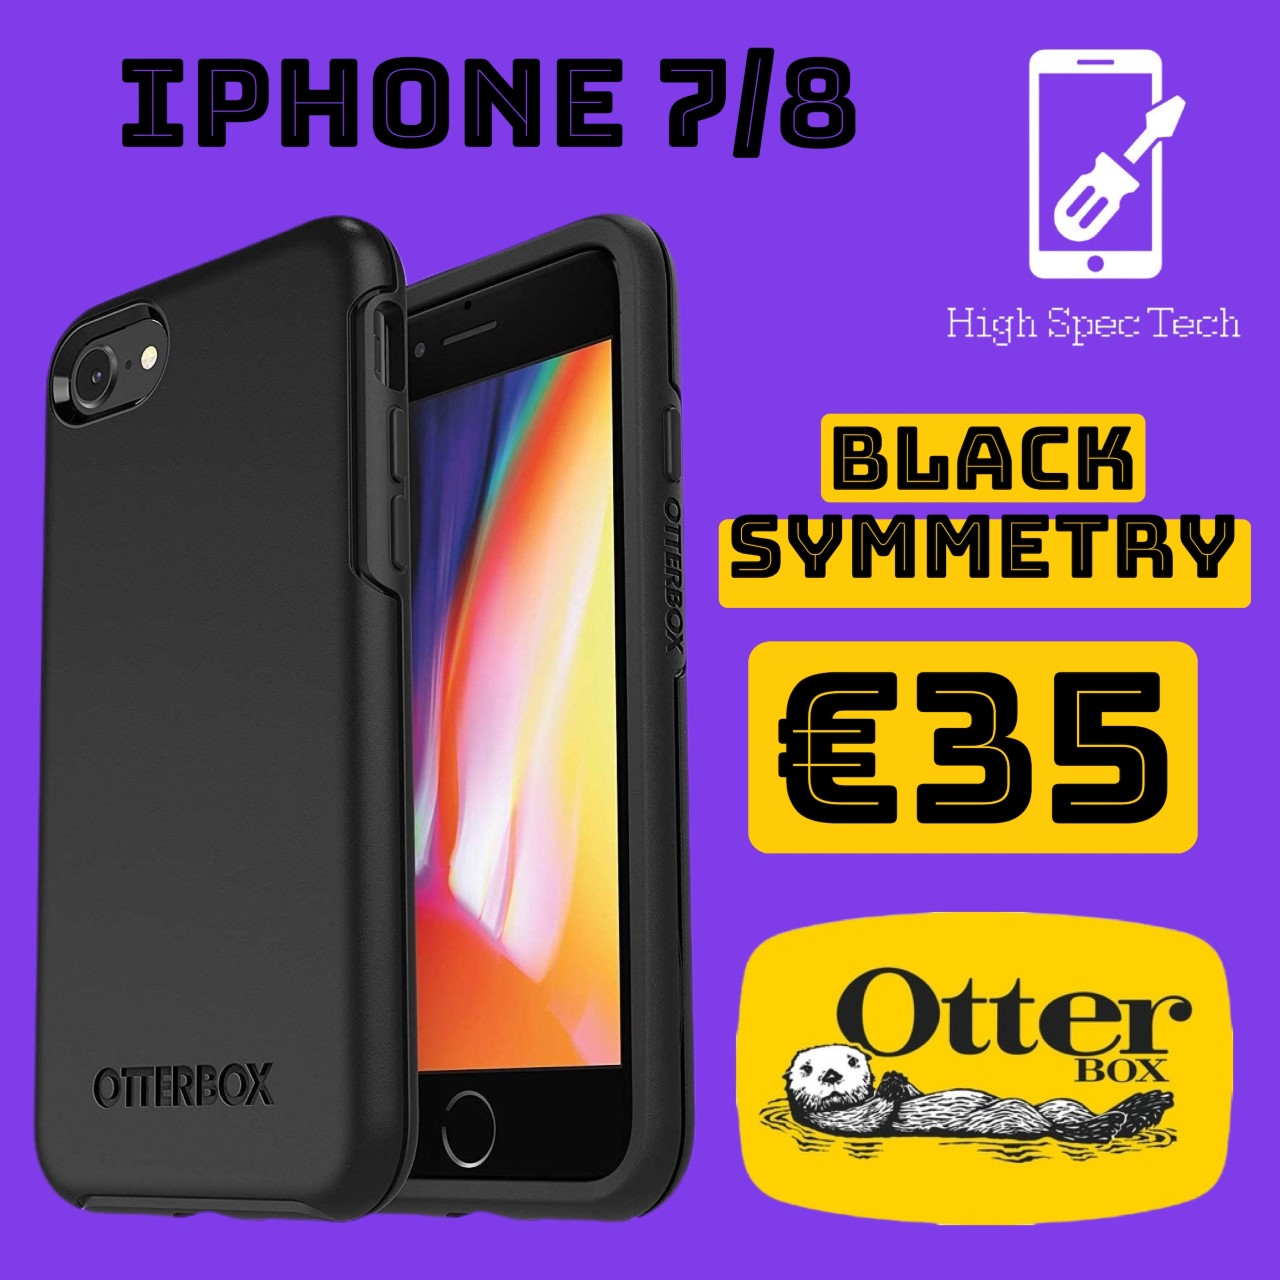 iphone 7/8 otterbox symmetry black